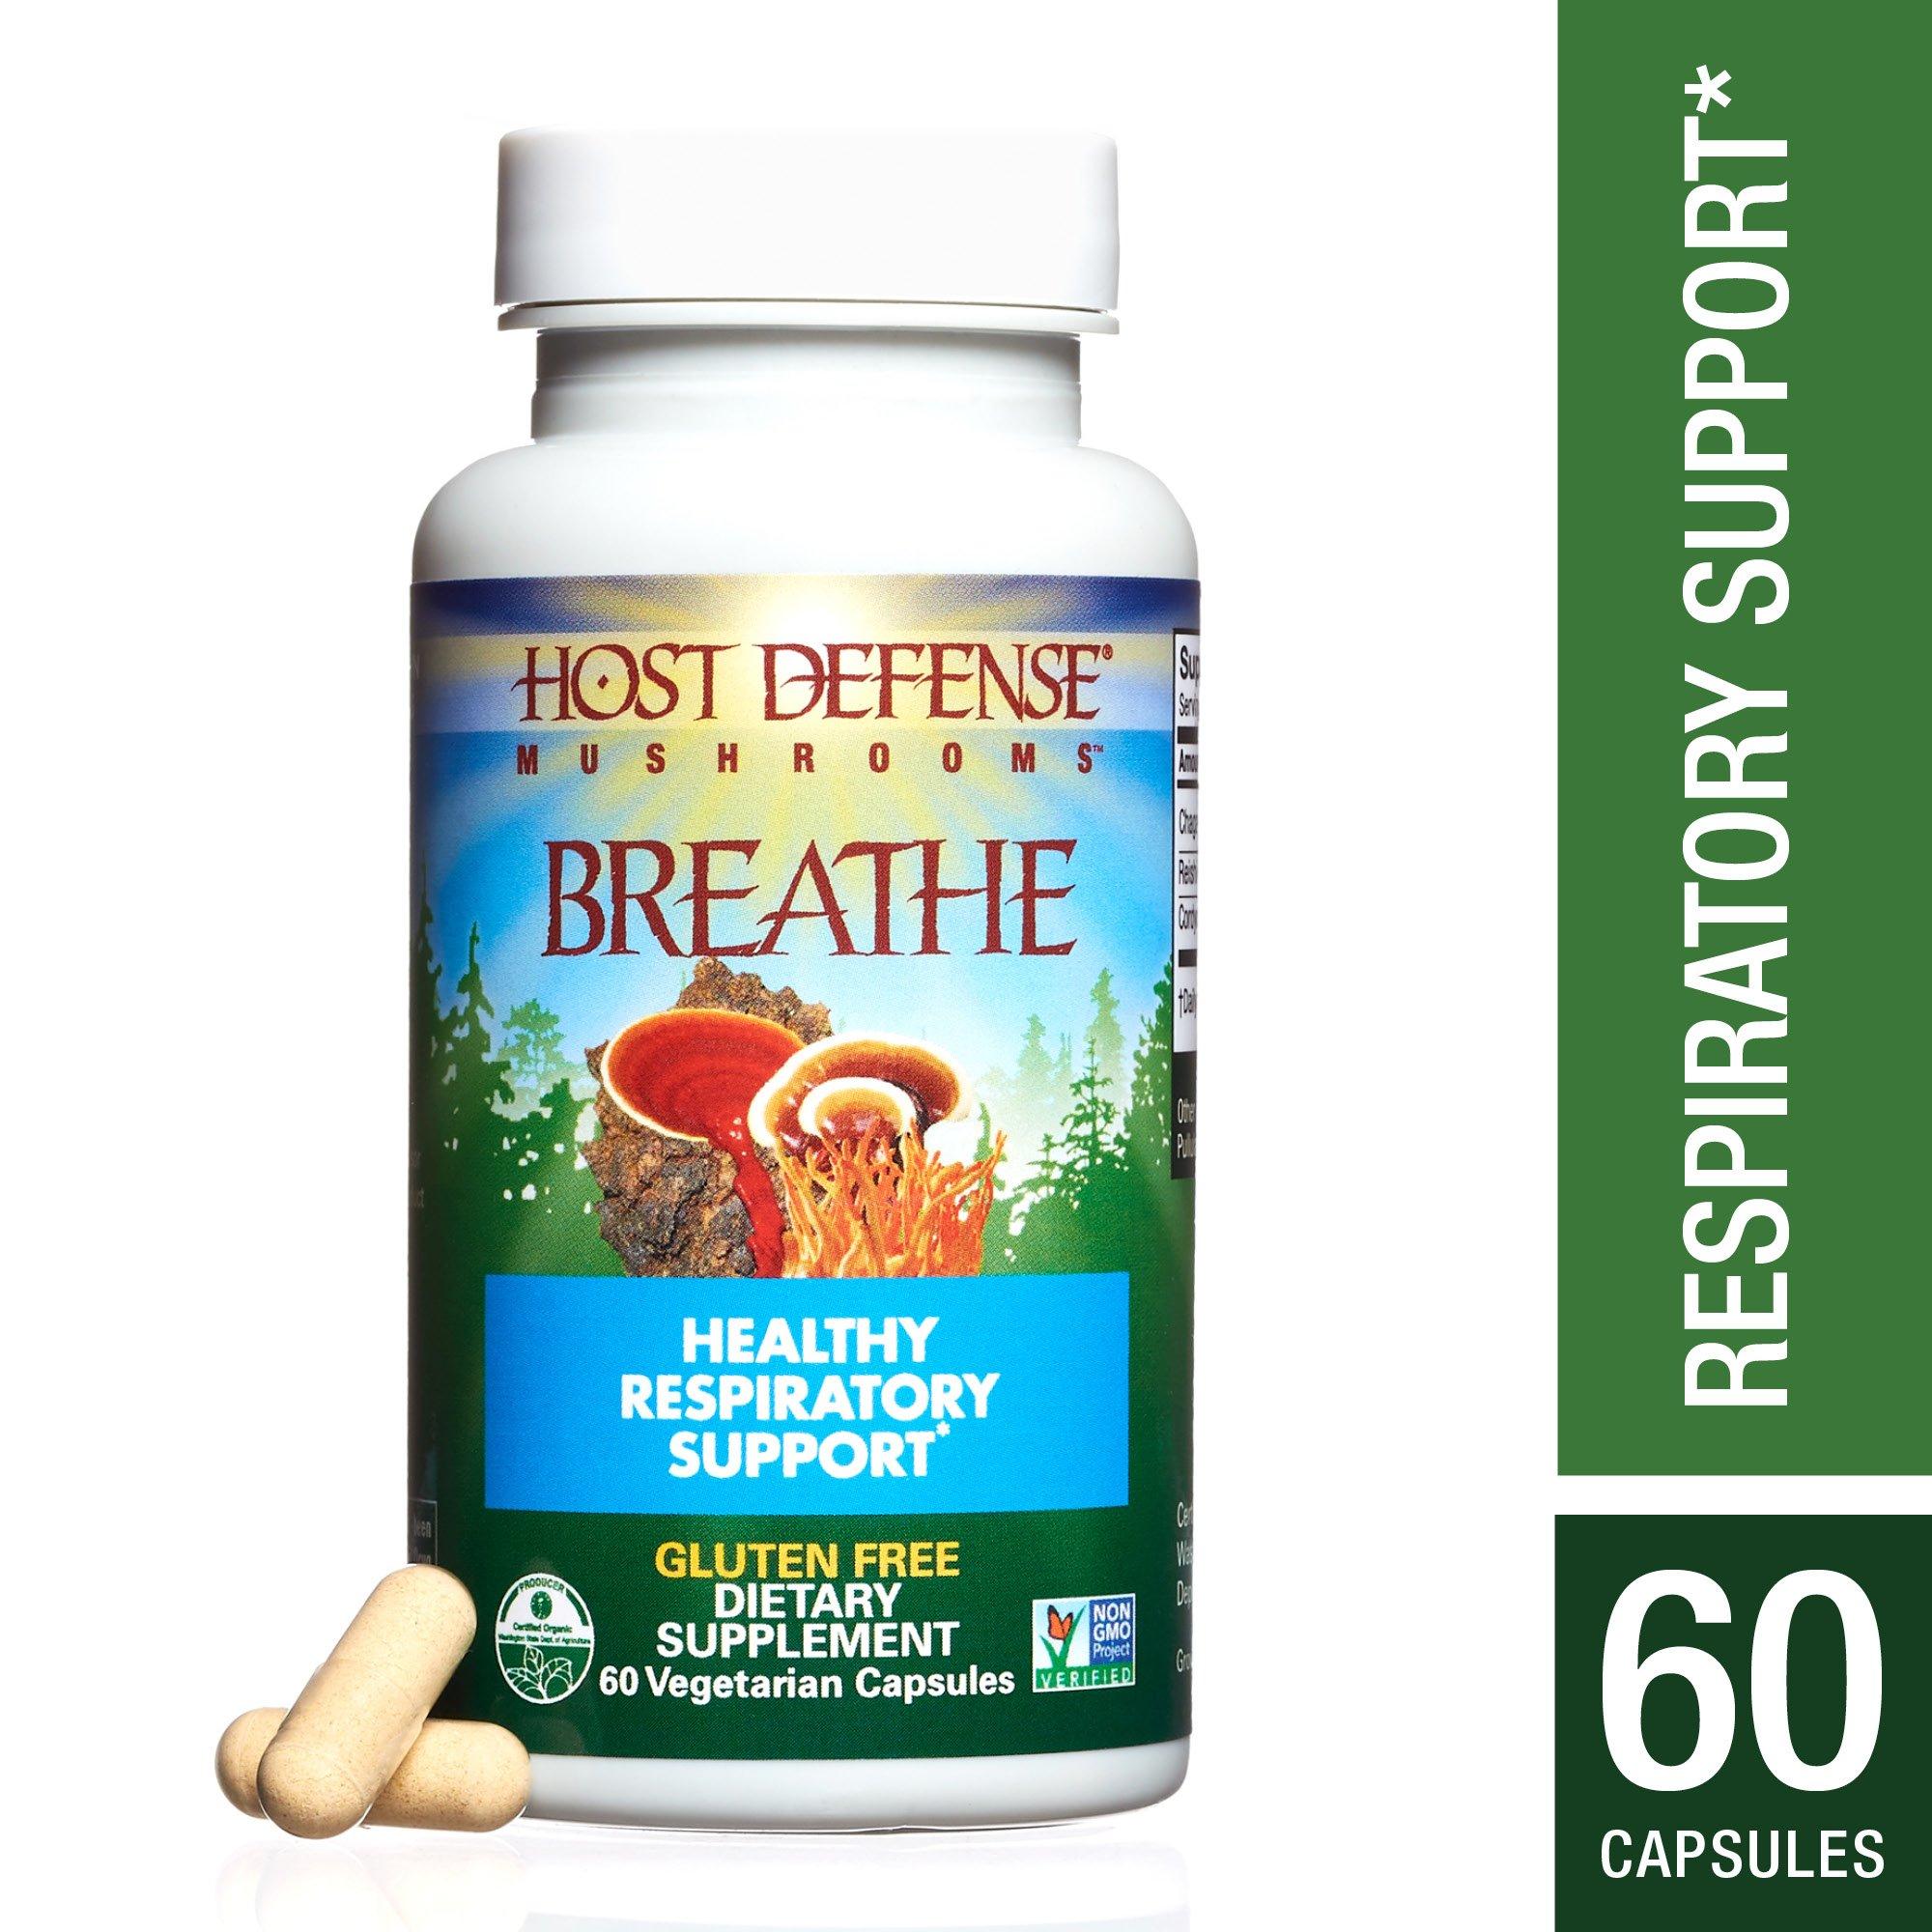 Host Defense - Breathe Capsules, Mushroom Support for Respiratory Health, 60 Count (FFP)